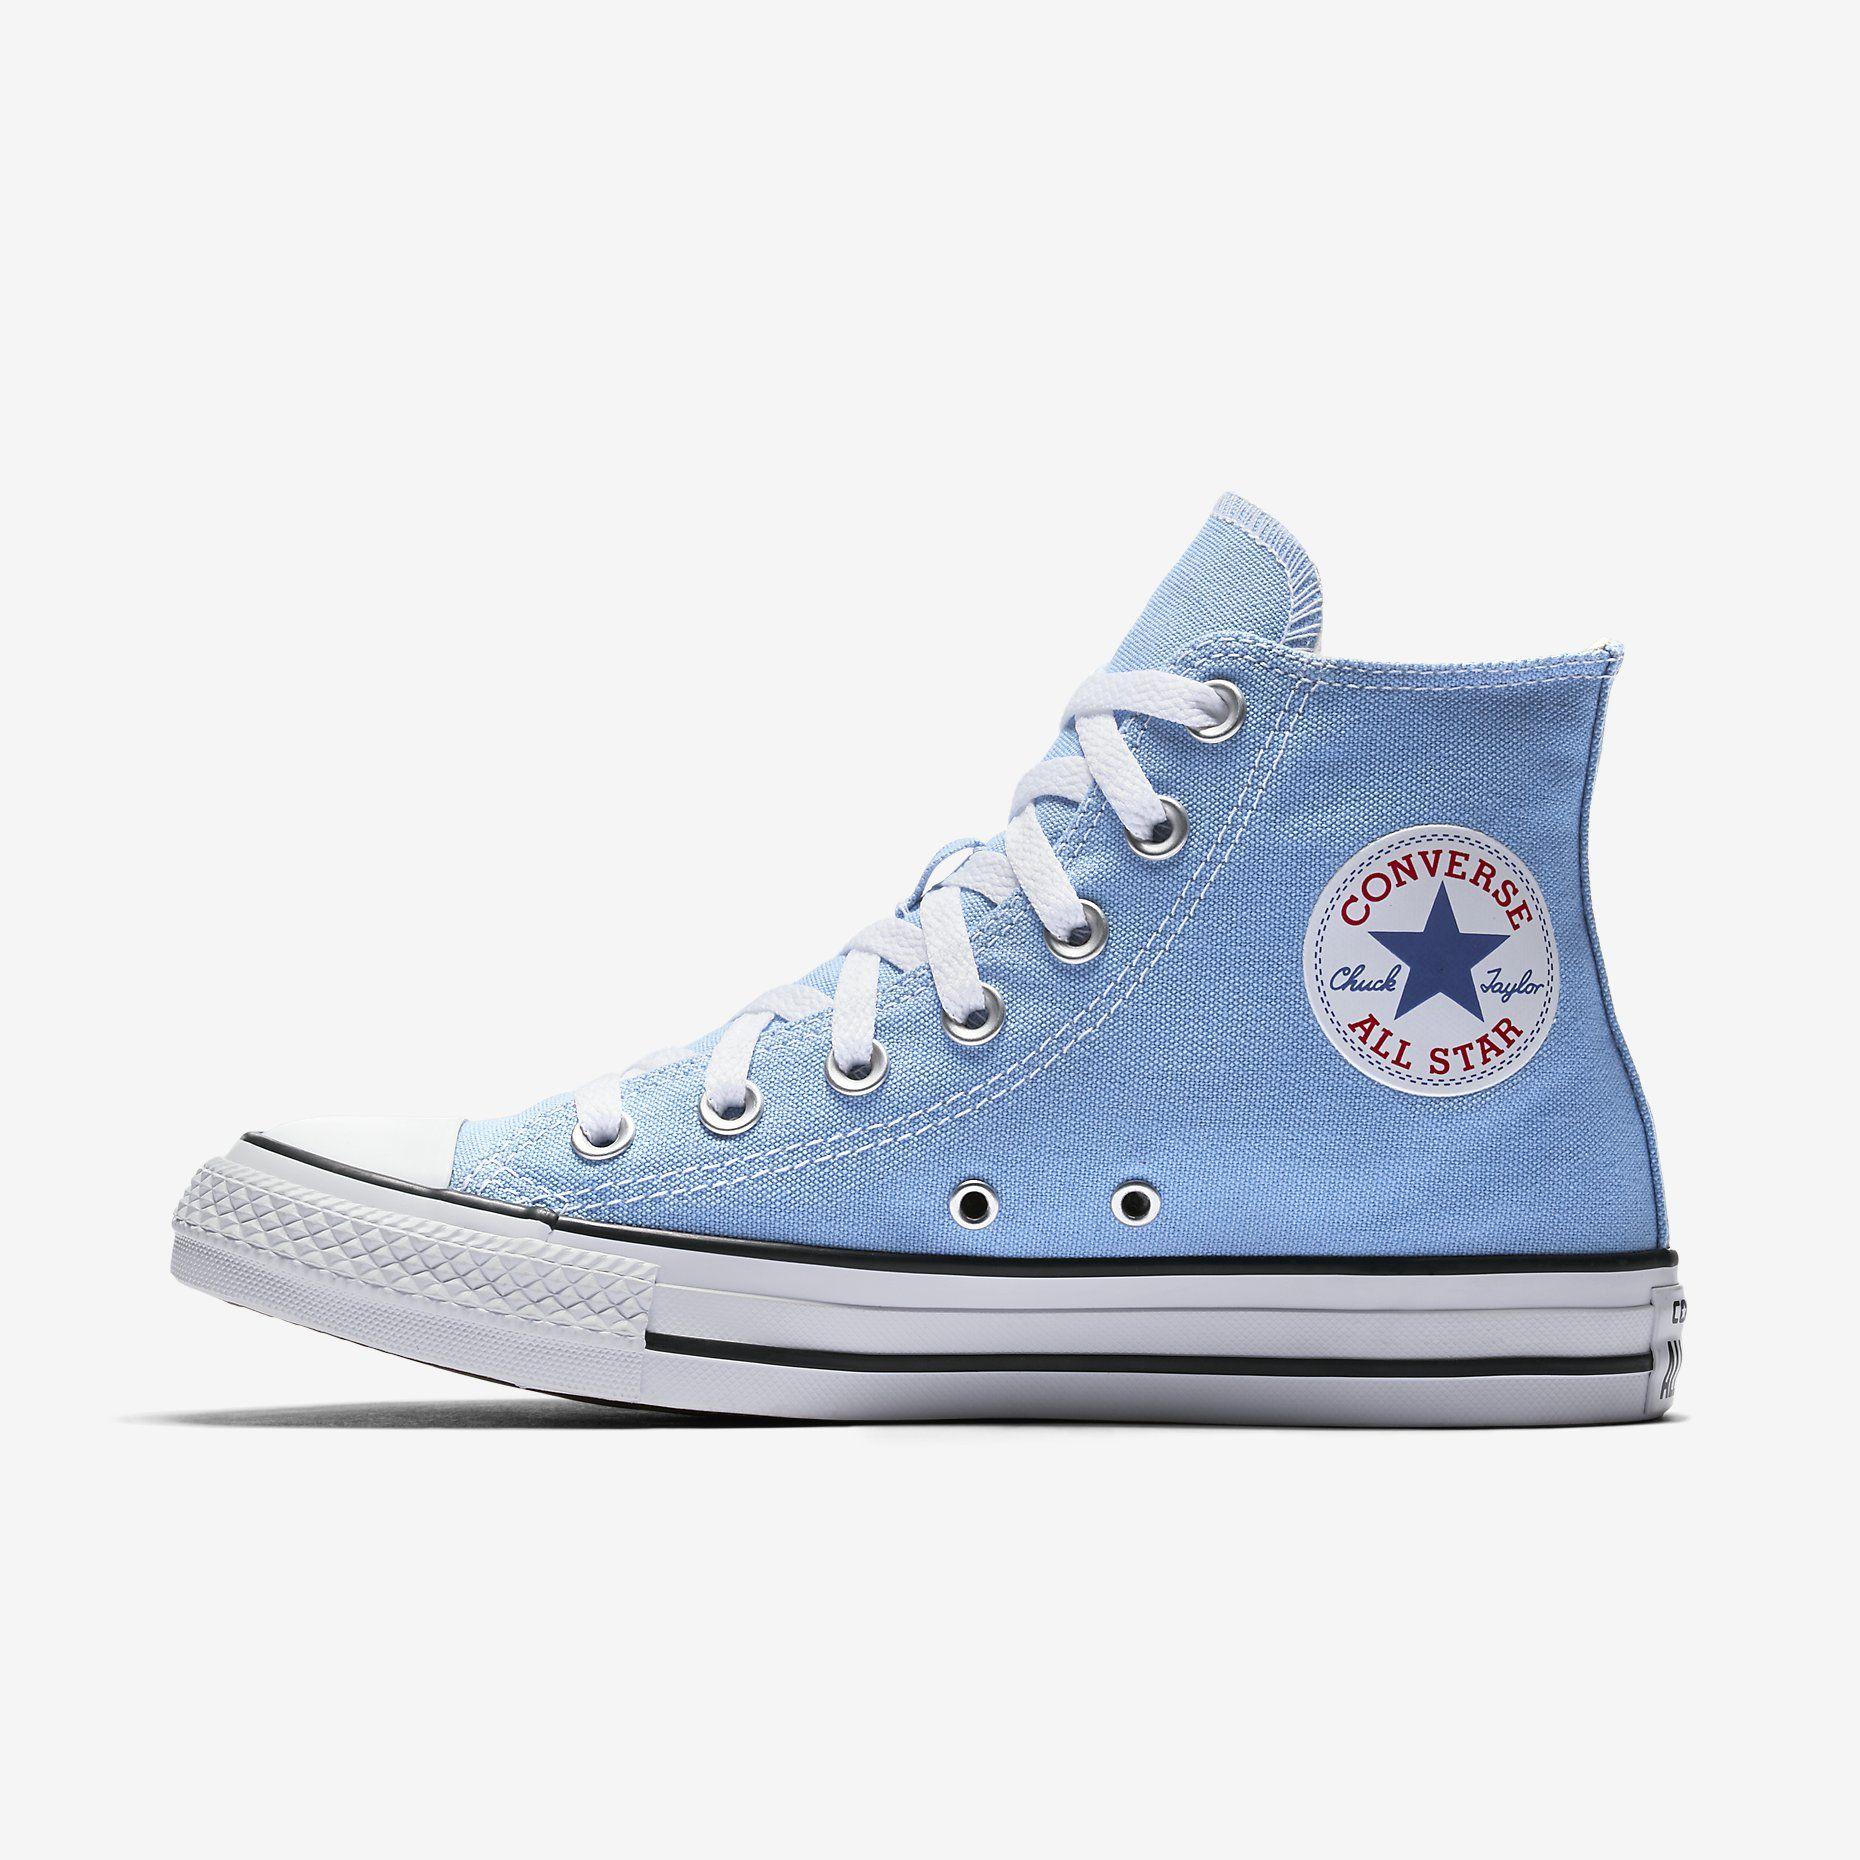 73fe25a5267155 Converse Chuck Taylor All Star Seasonal High Top Unisex Shoe. Nike ...